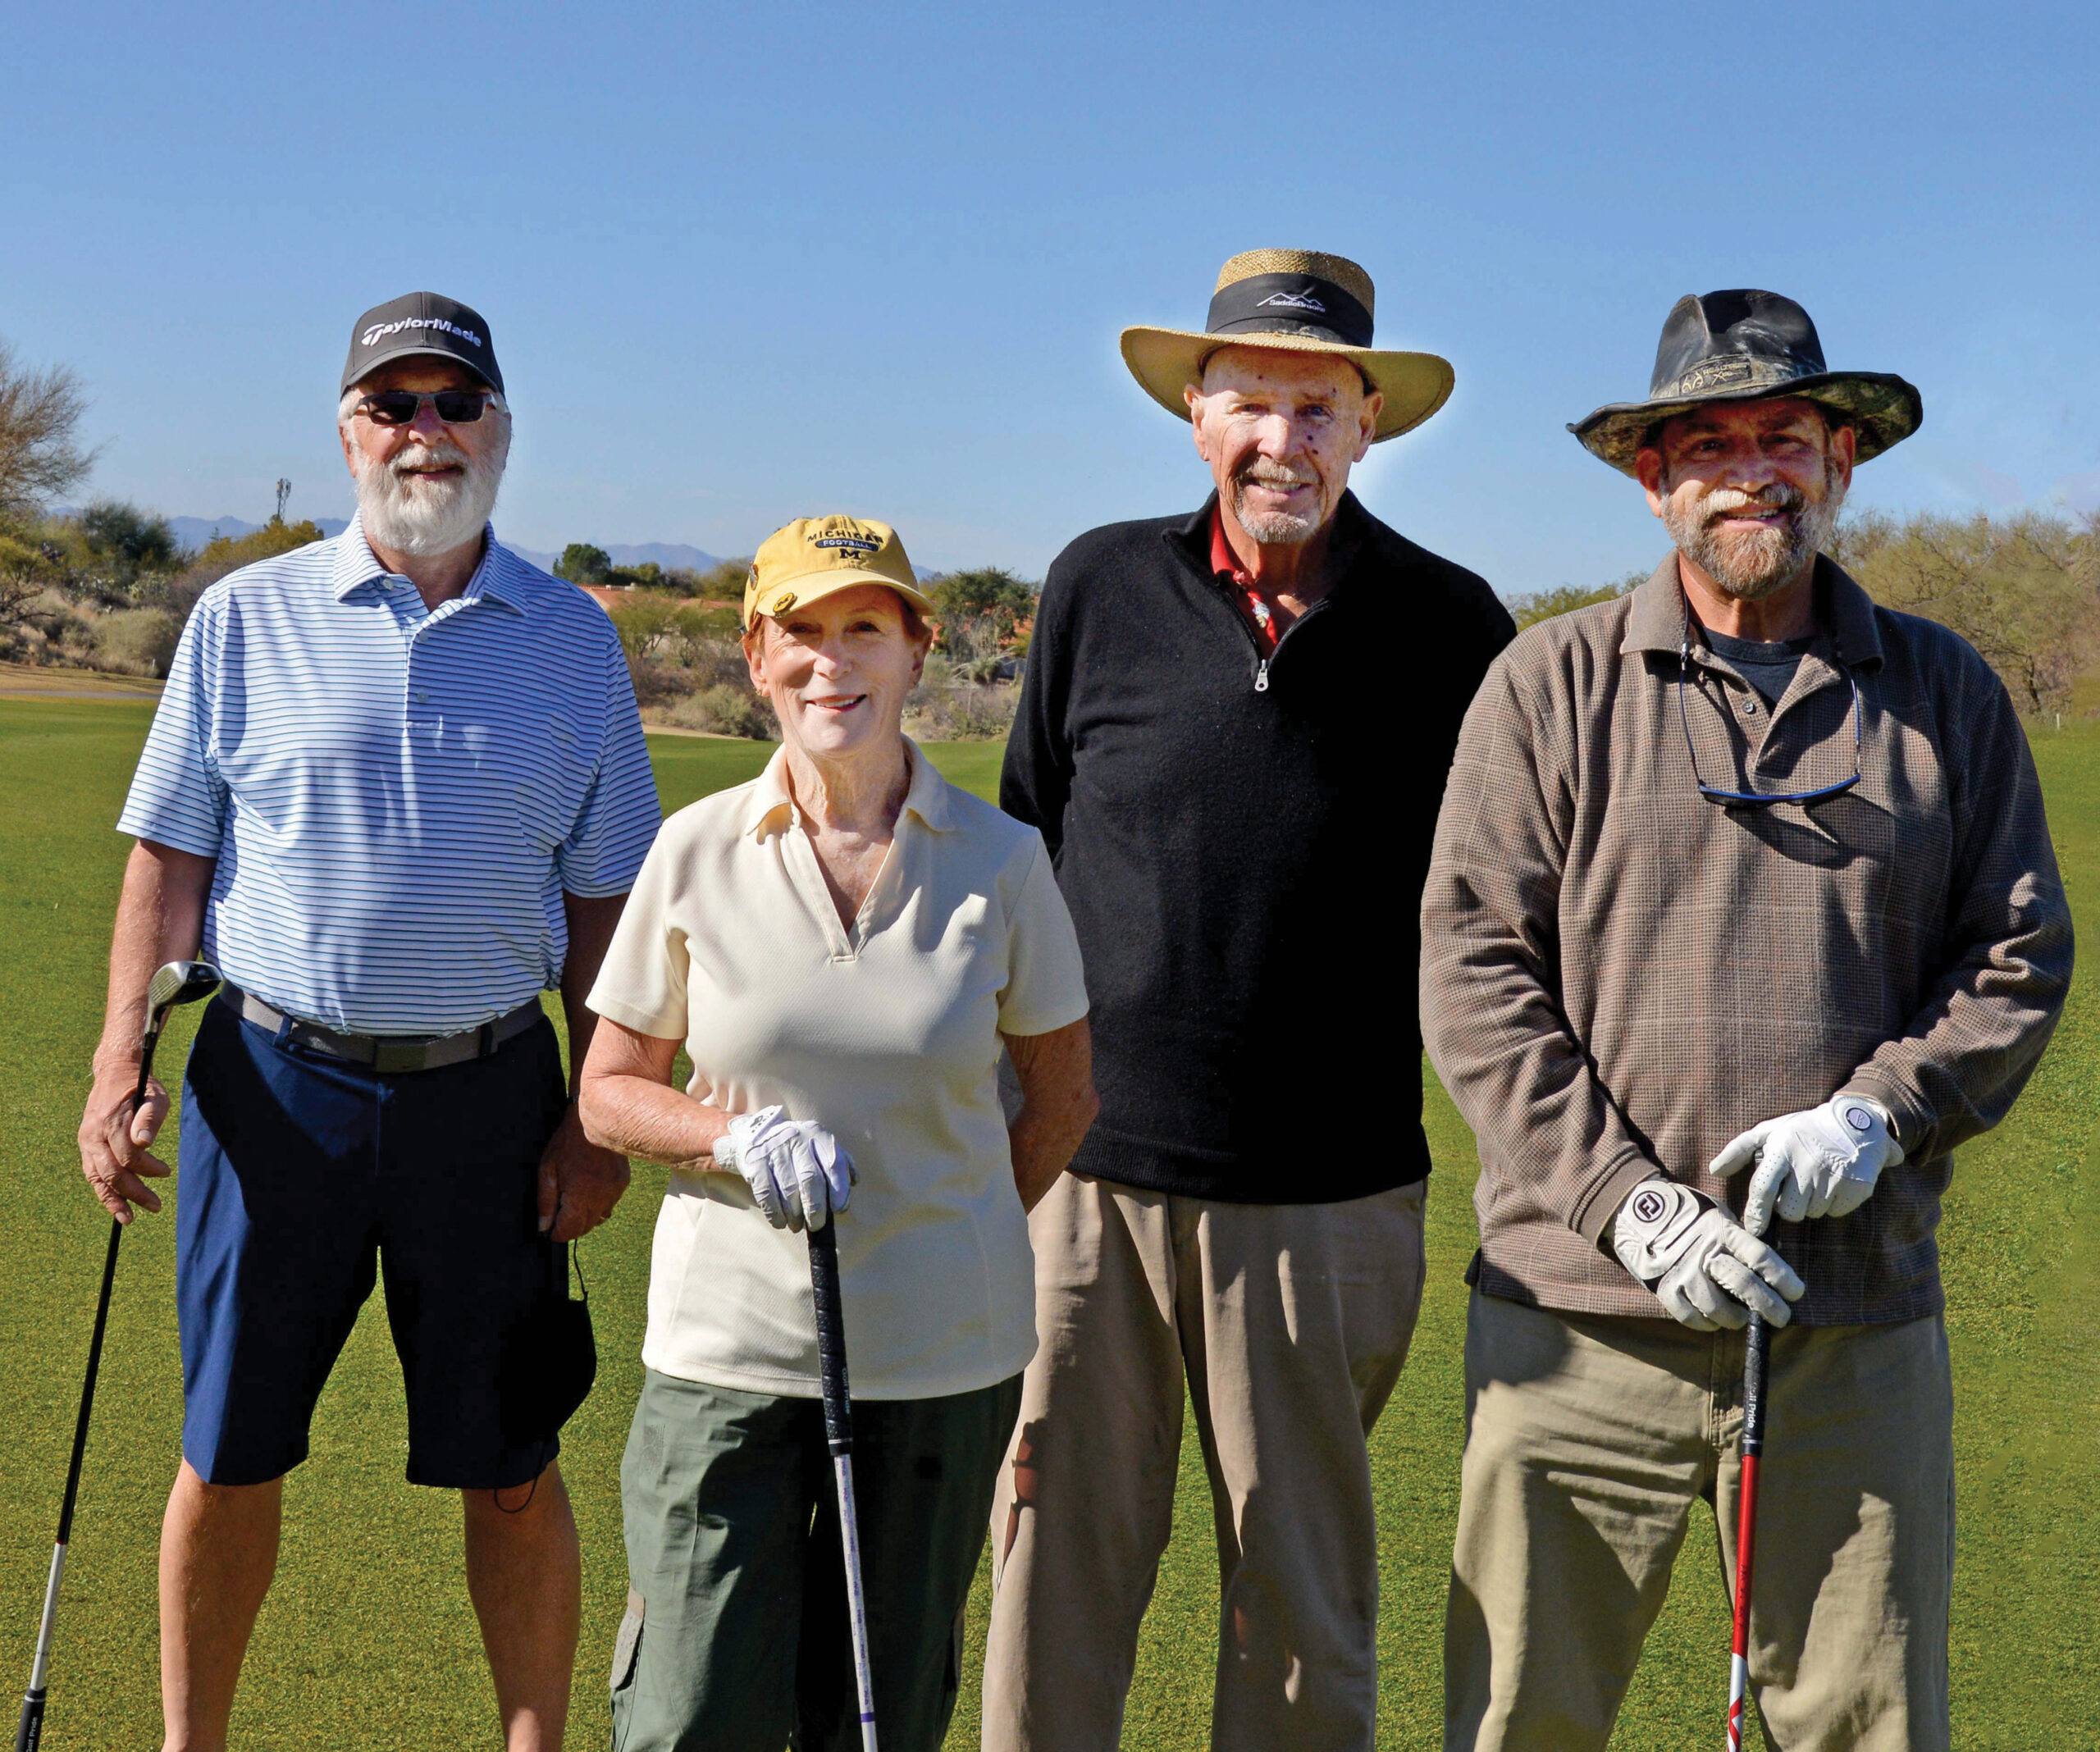 Winners: John Thomas, Marsha Foresman, Calvin Saulsbury, and Bob Nelson